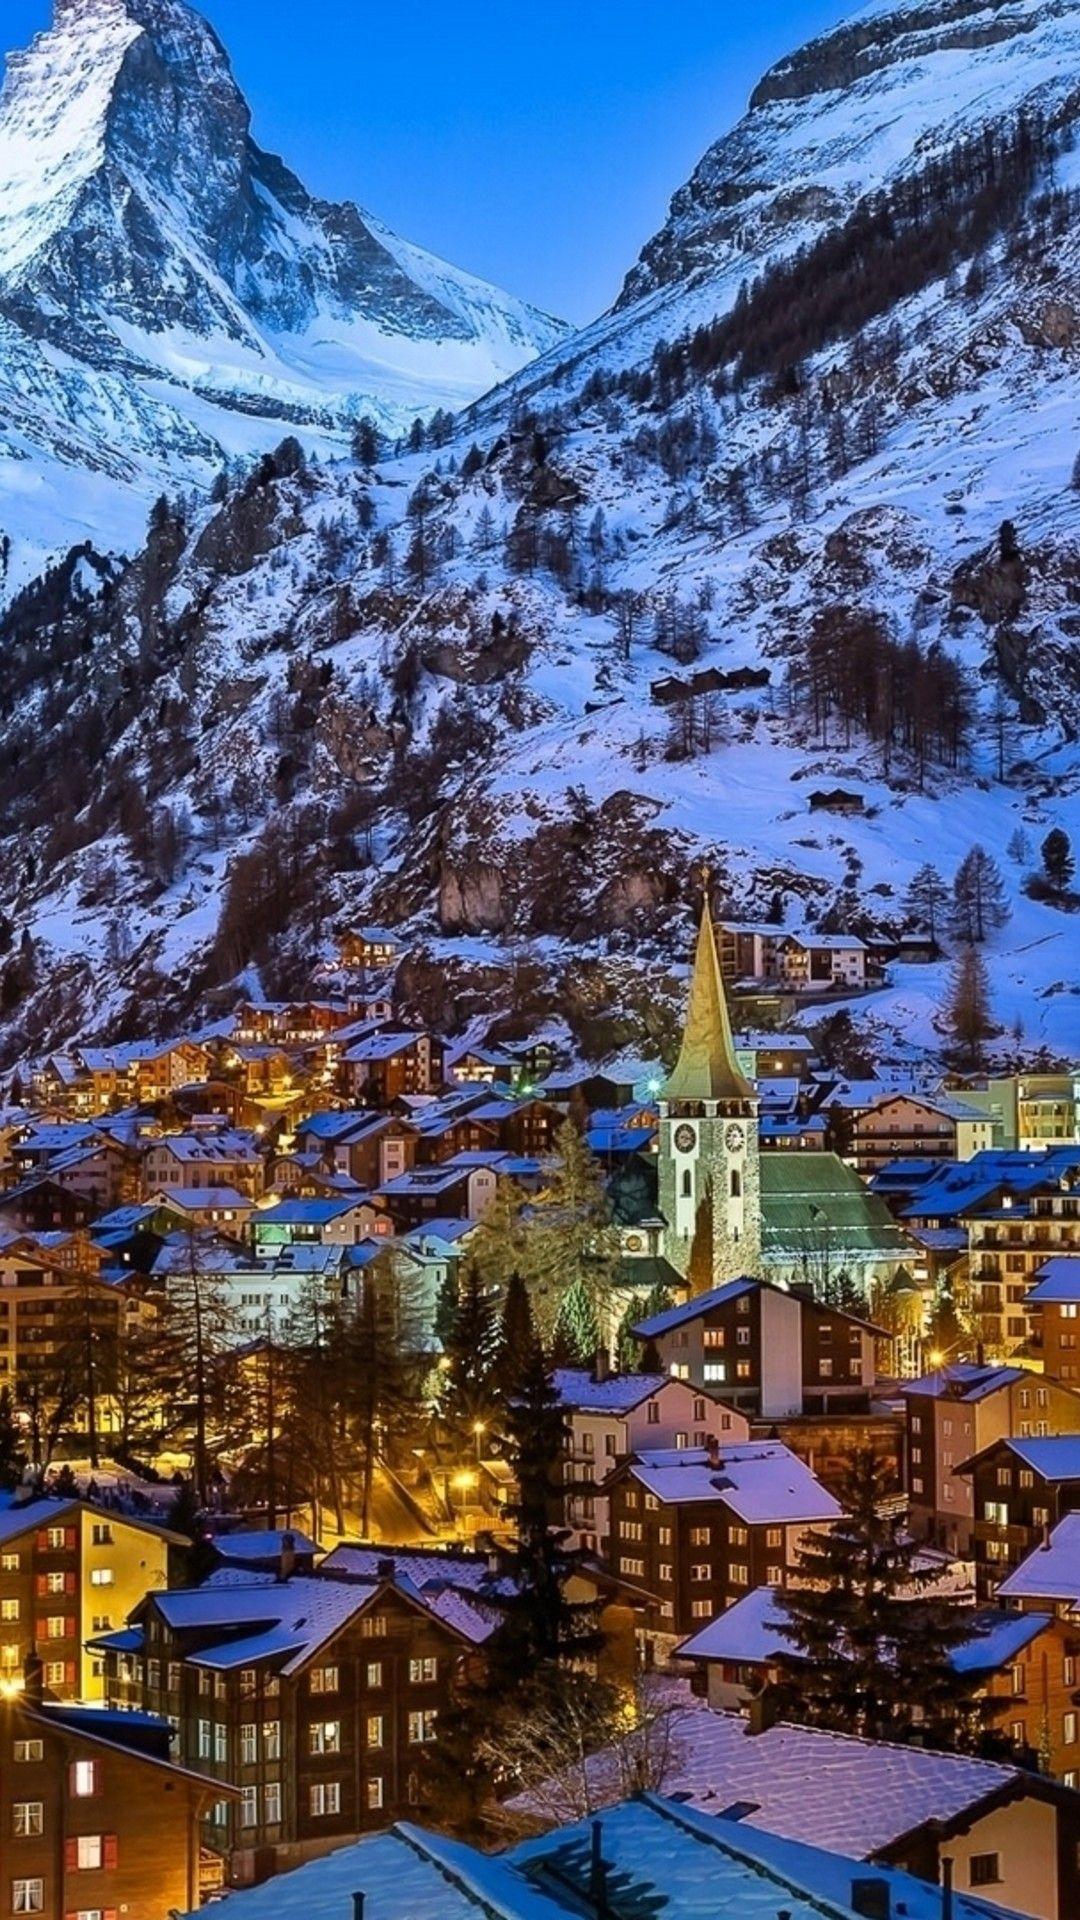 Wallpaper Download 1080x1920 Winter At Zermatt Valley Switzerland Winter Wallpapers Seasons Wallpapers Cool Places To Visit Best Ski Resorts Places To Visit